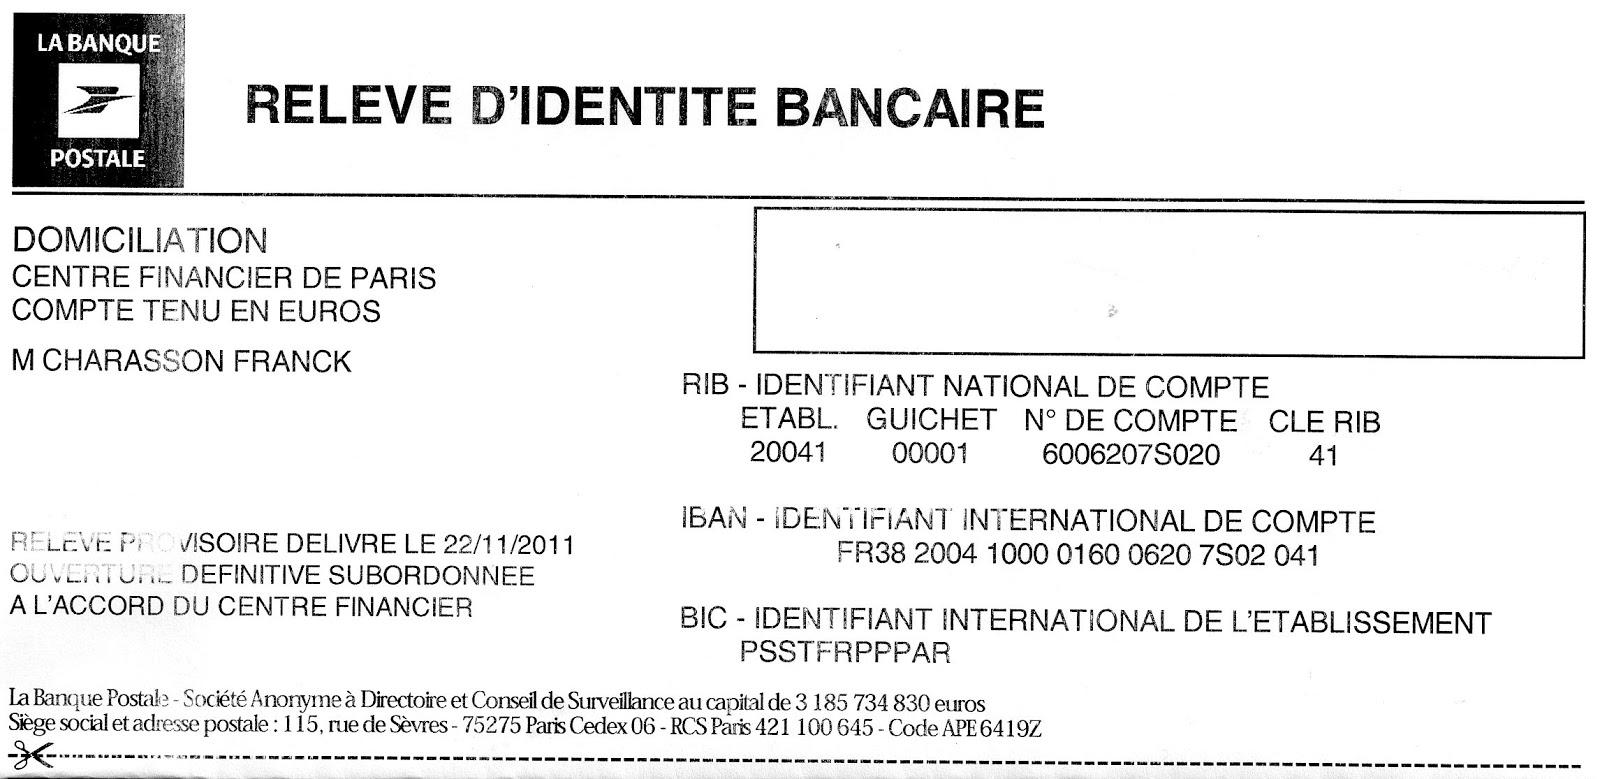 Iban La Banque Postale Steadlane Club